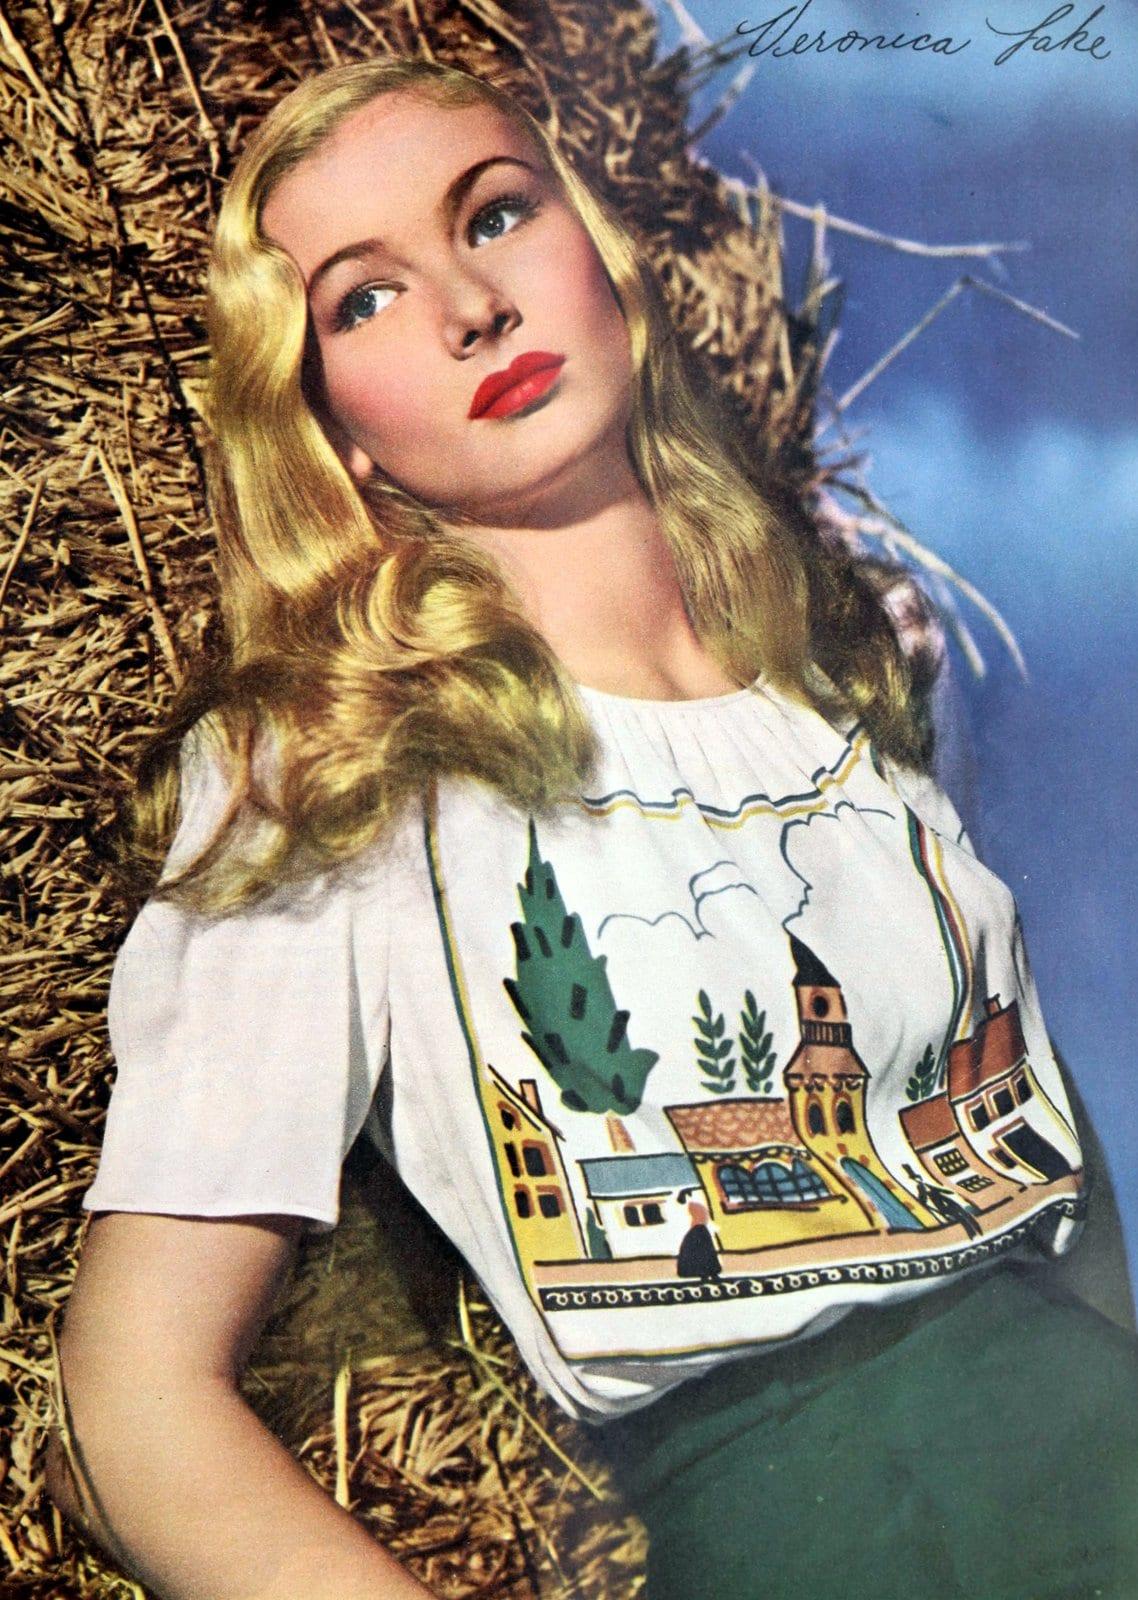 Vintage 1940s actress Veronica Lake wearing red lipstick